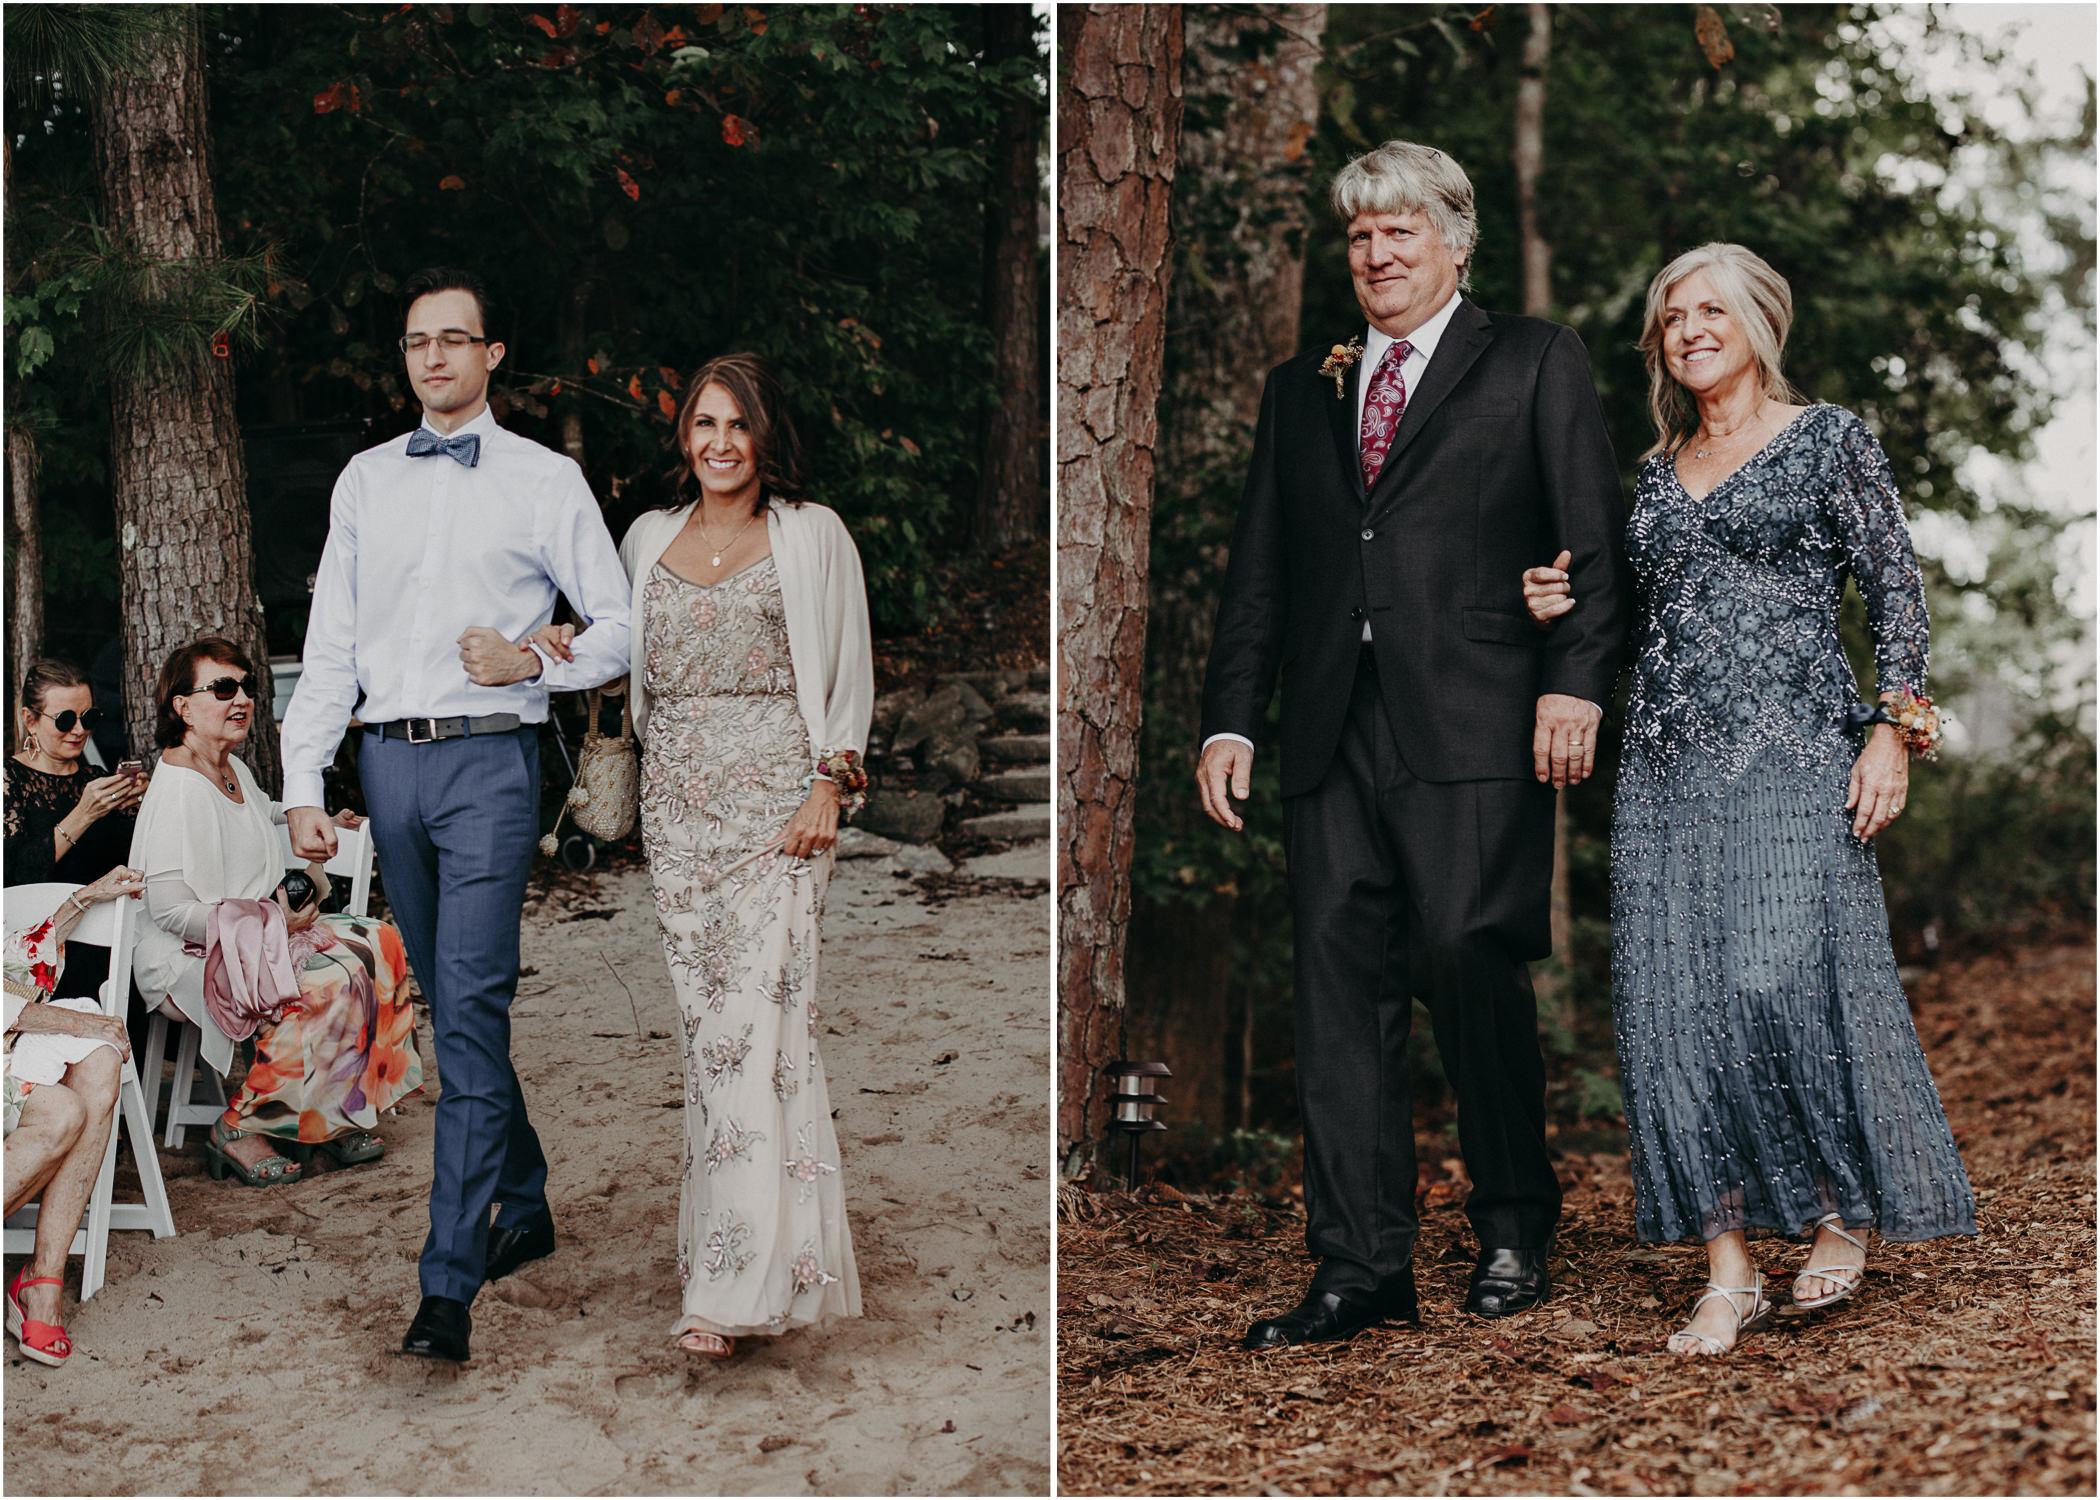 92 Wedding Ceremony - Destination Wedding : Beach : Lake Wedding Atlanta Wedding Photographer .jpg